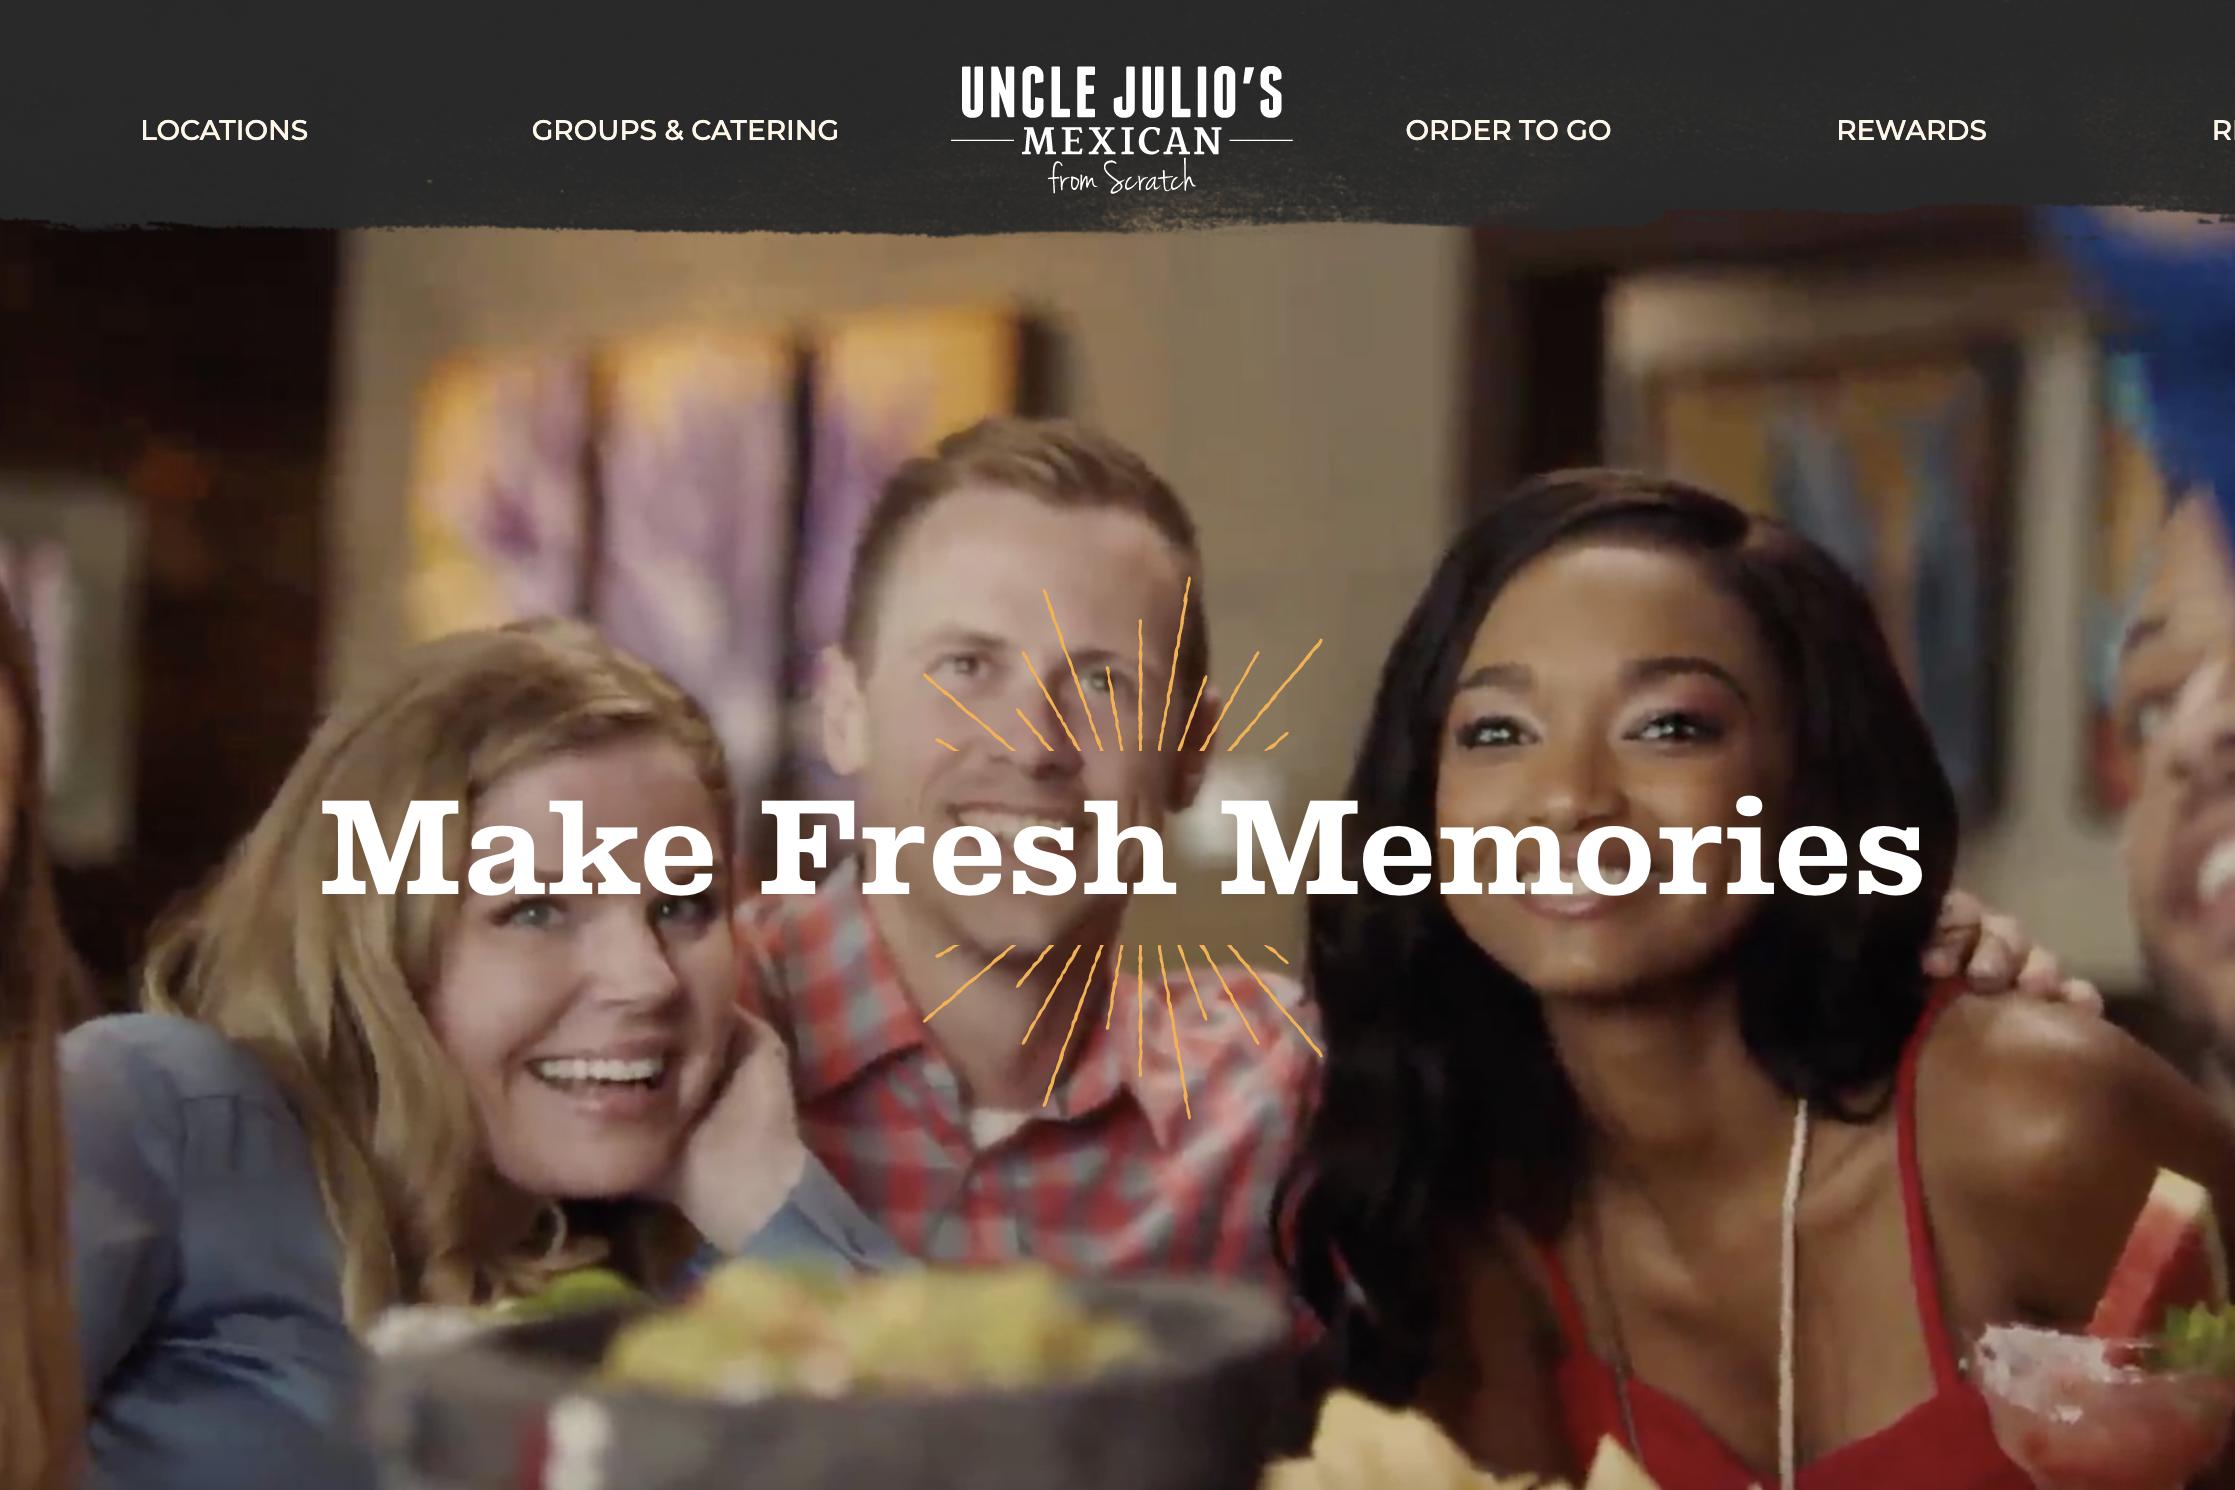 Uncle Julio's website